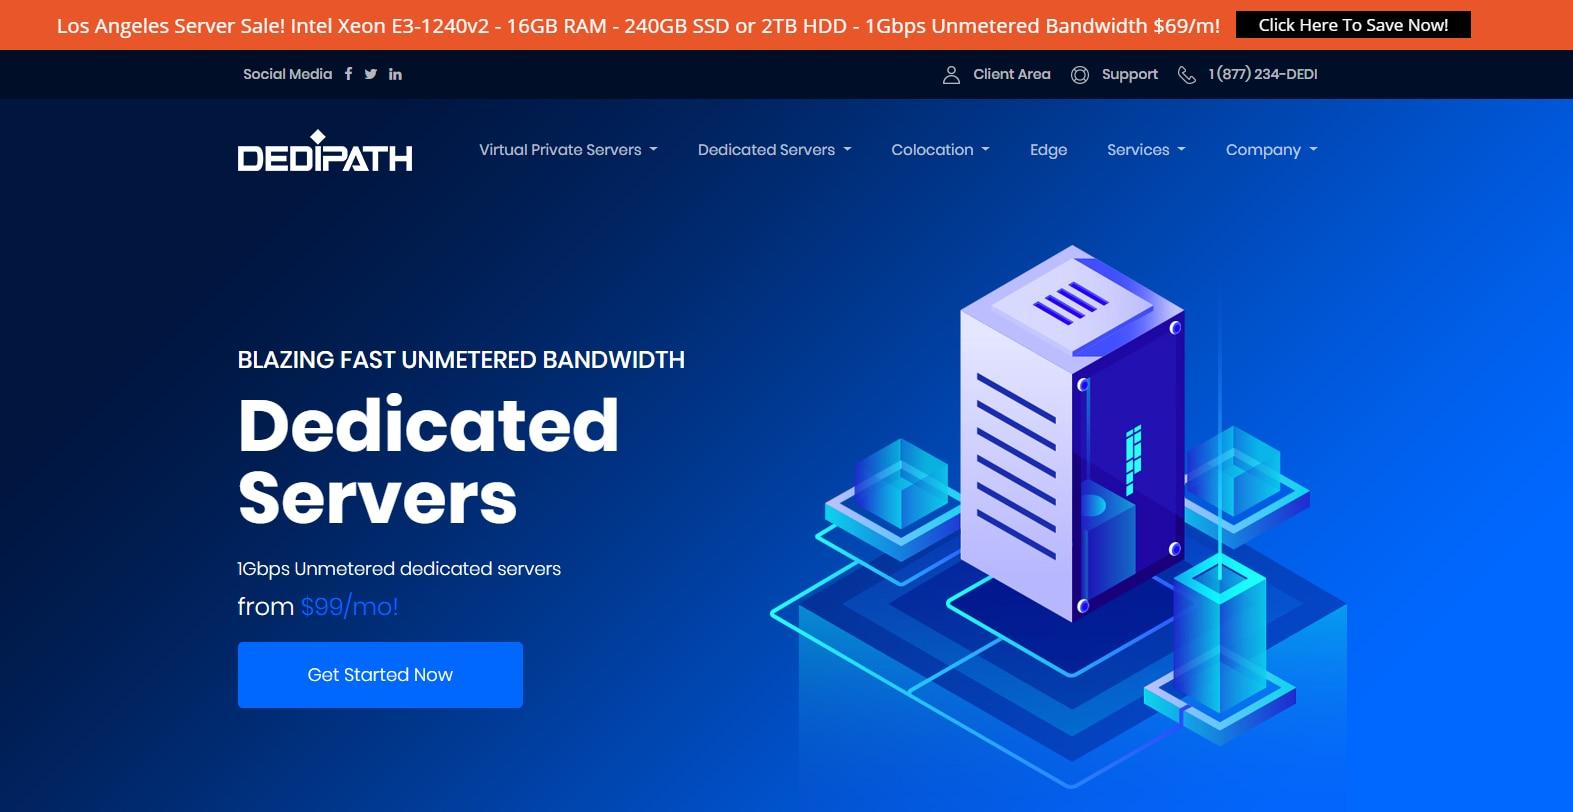 DediPath 独服促销活动 Intel Xeon E3-1240v2/16g内存/2T硬盘 $69/月